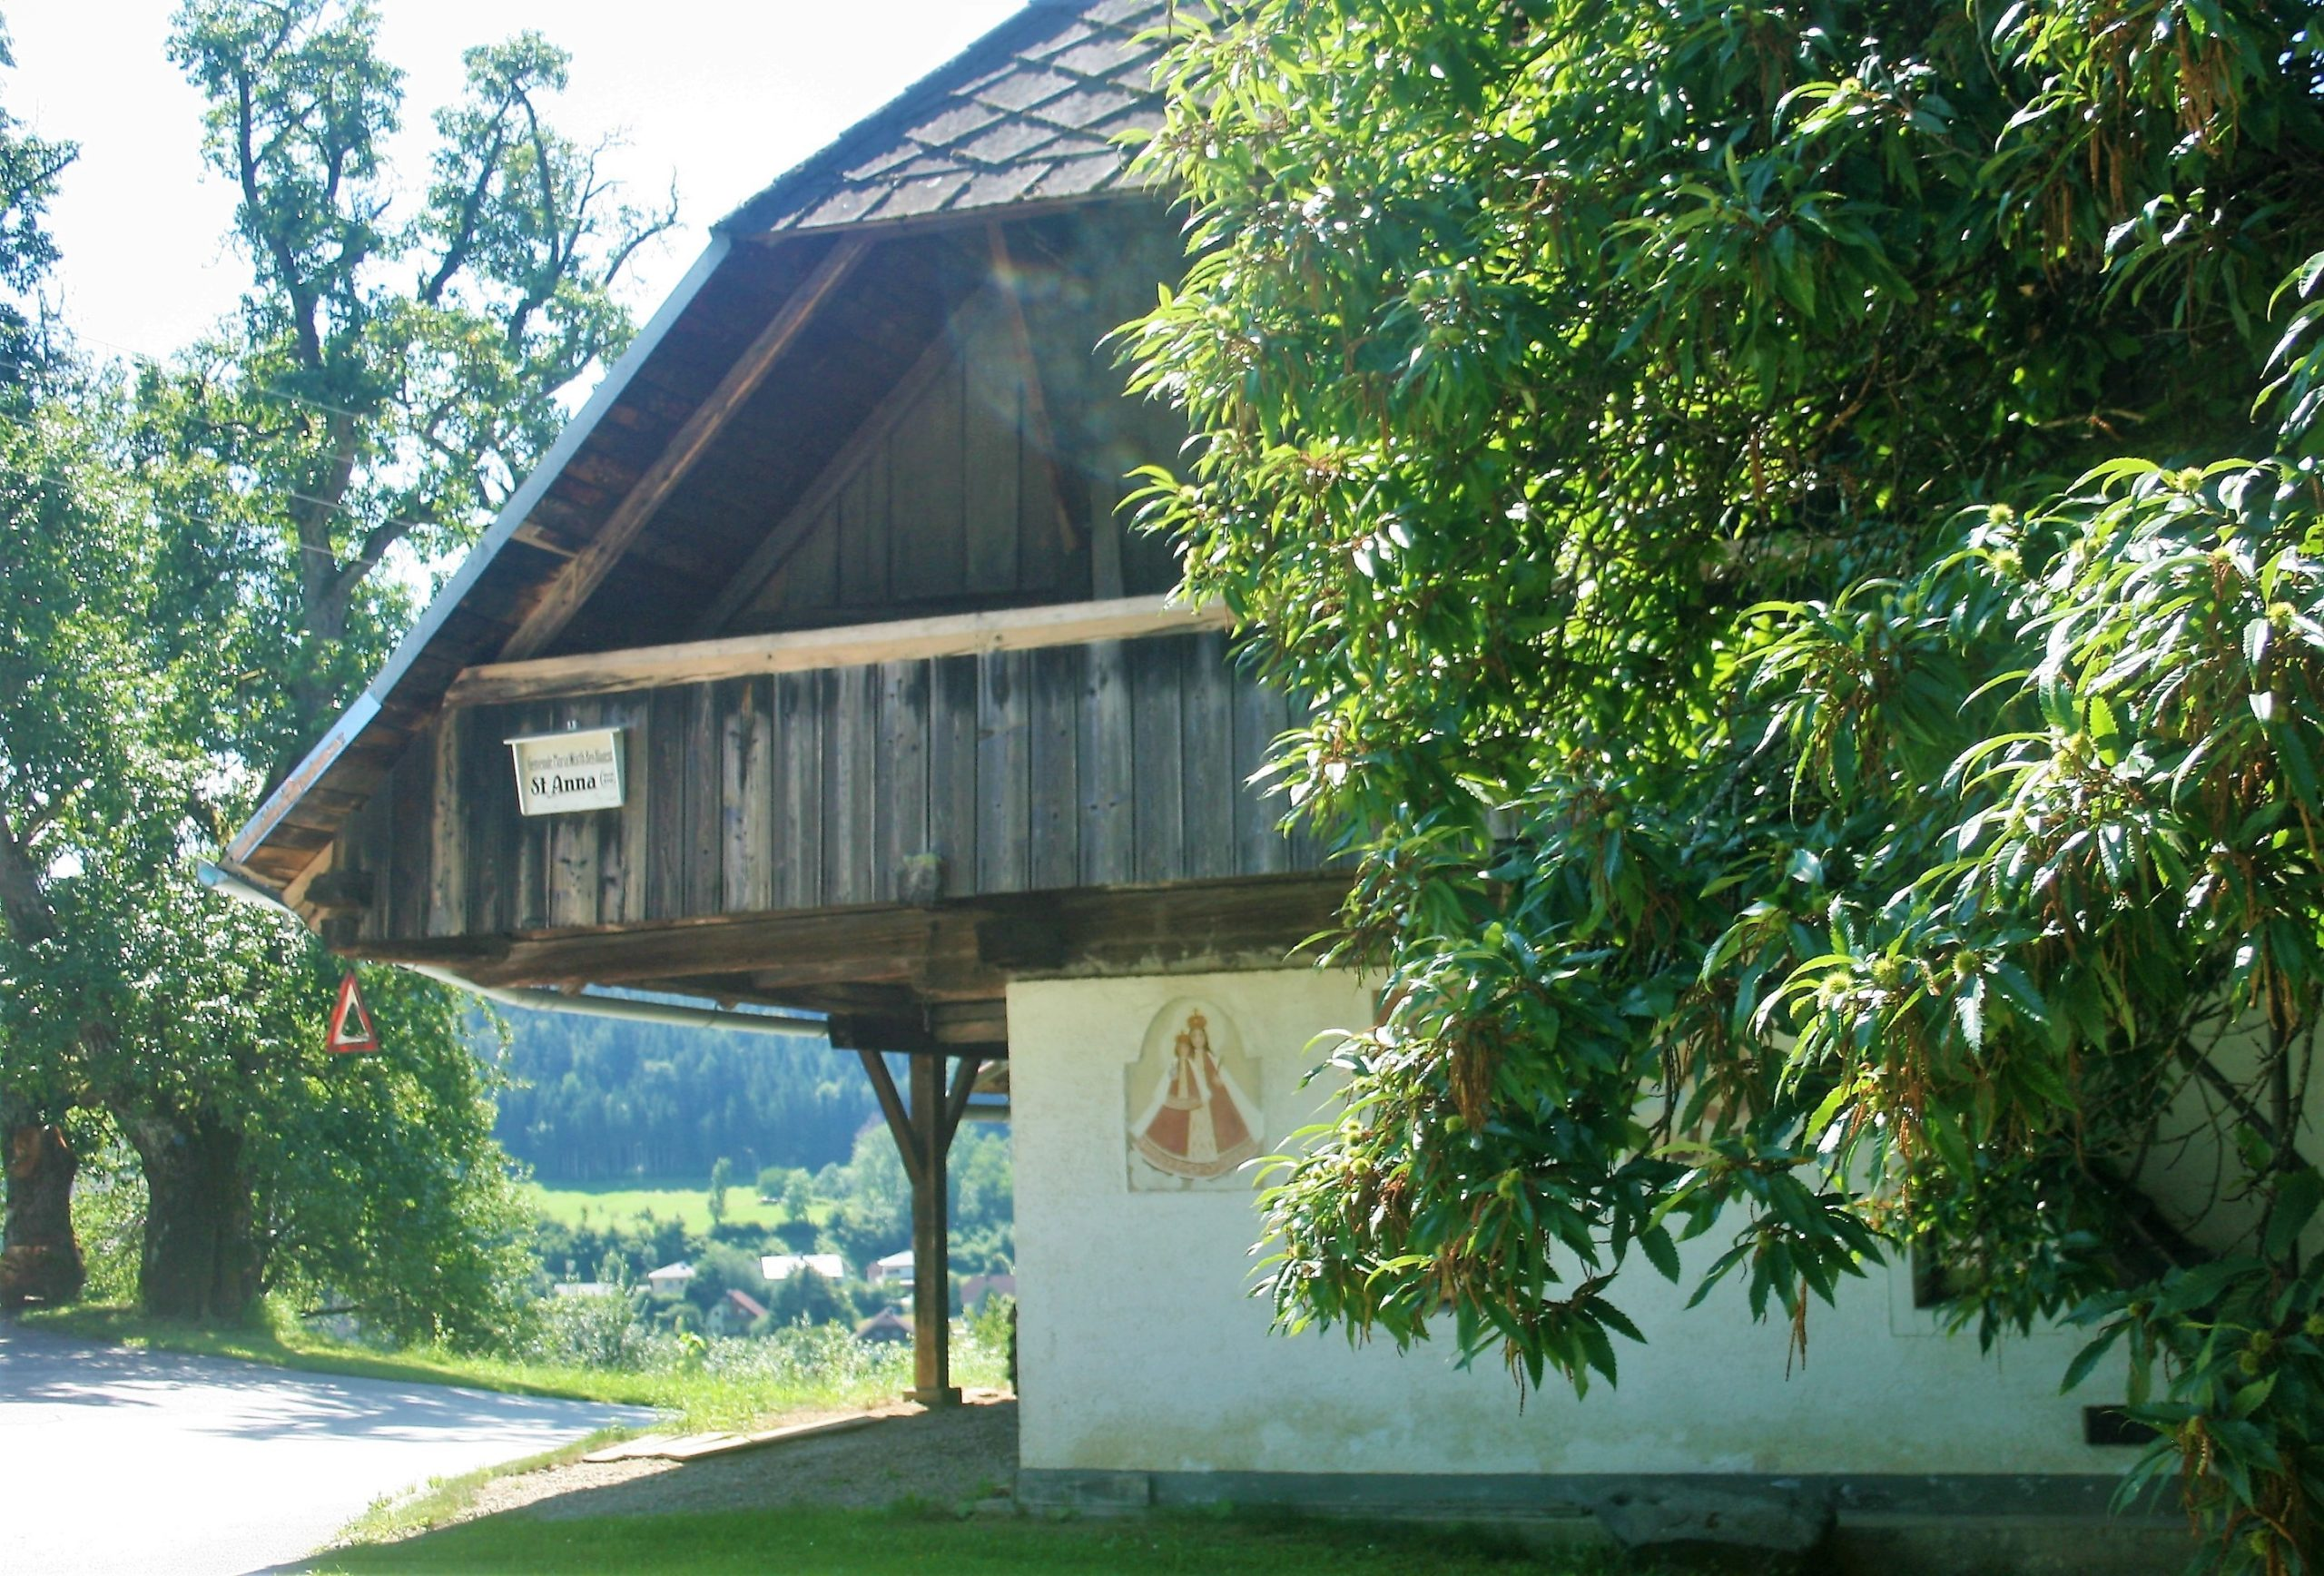 Wegweiser zur Kirche St. Anna. Foto: Birgit Frank